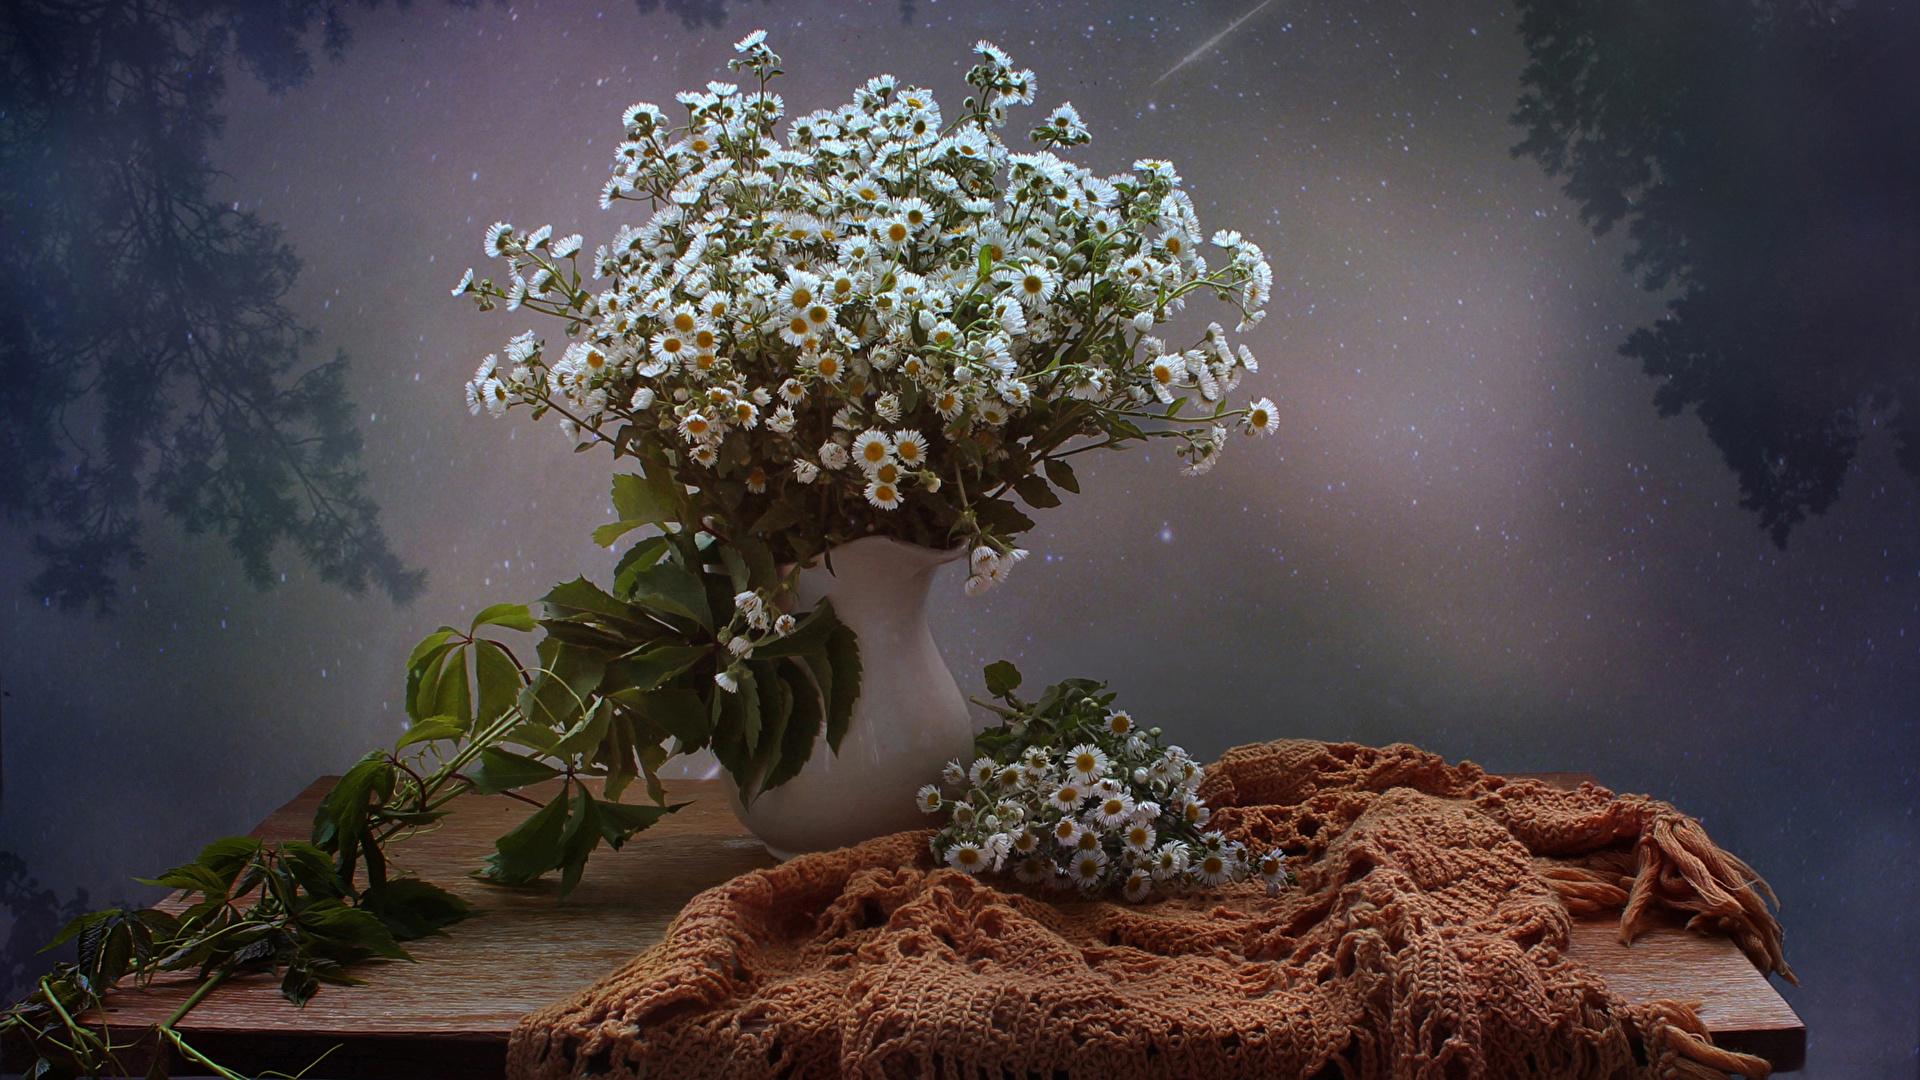 Image Bouquets Flowers Matricaria Vase Many Still Life 1920x1080